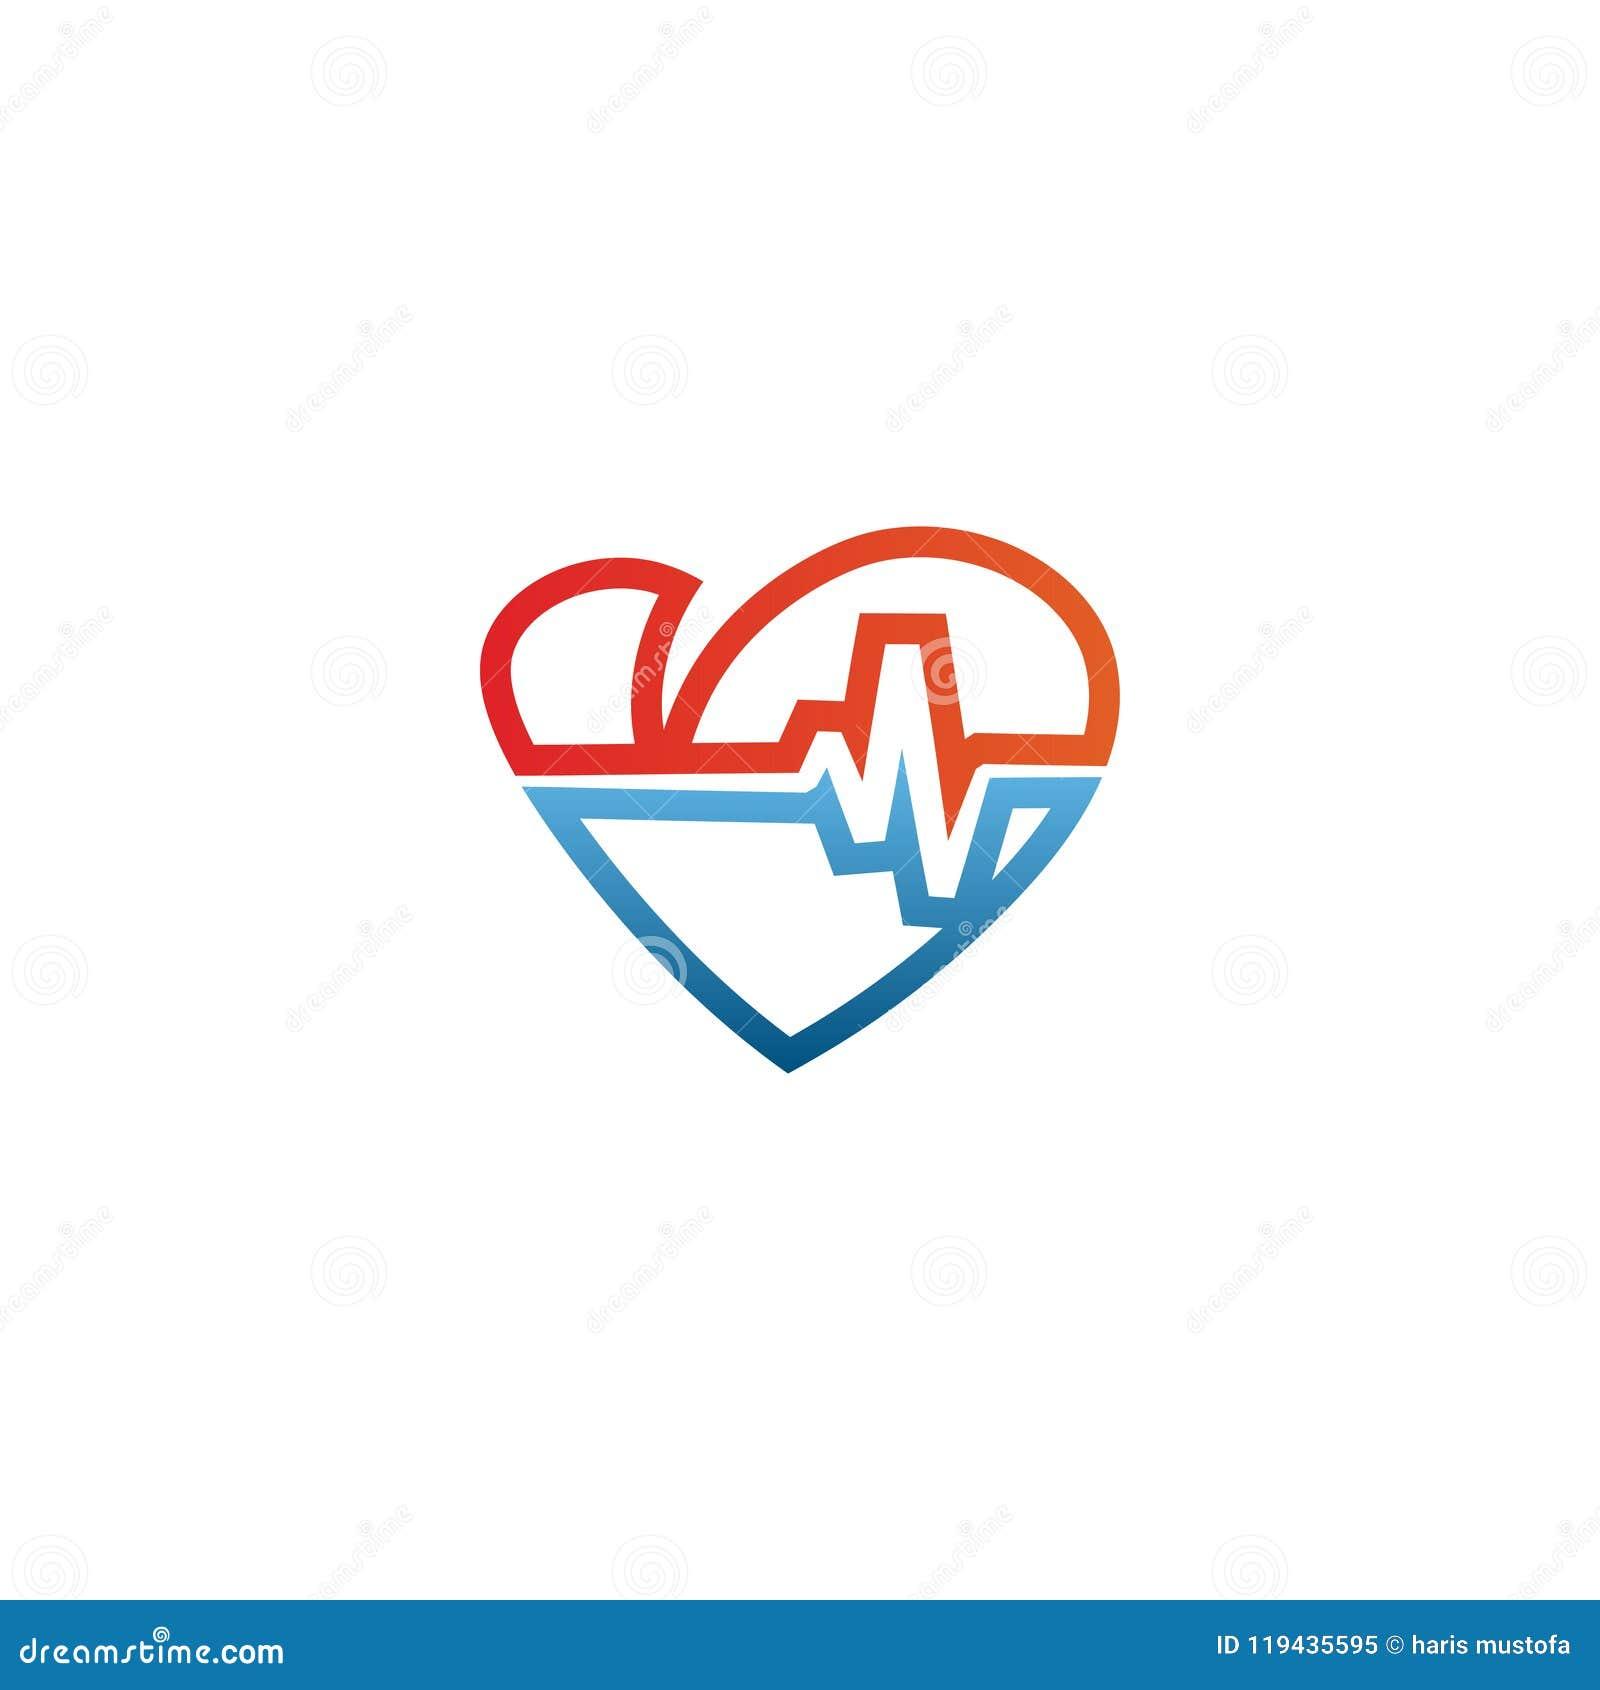 Elegant Logo Outline Wiring Diagrams Voltage Control Circuit Get Domain Pictures Getdomainvidscom Heart And Ekg Design Template Stock Vector Rh Dreamstime Com Shapes Fonts